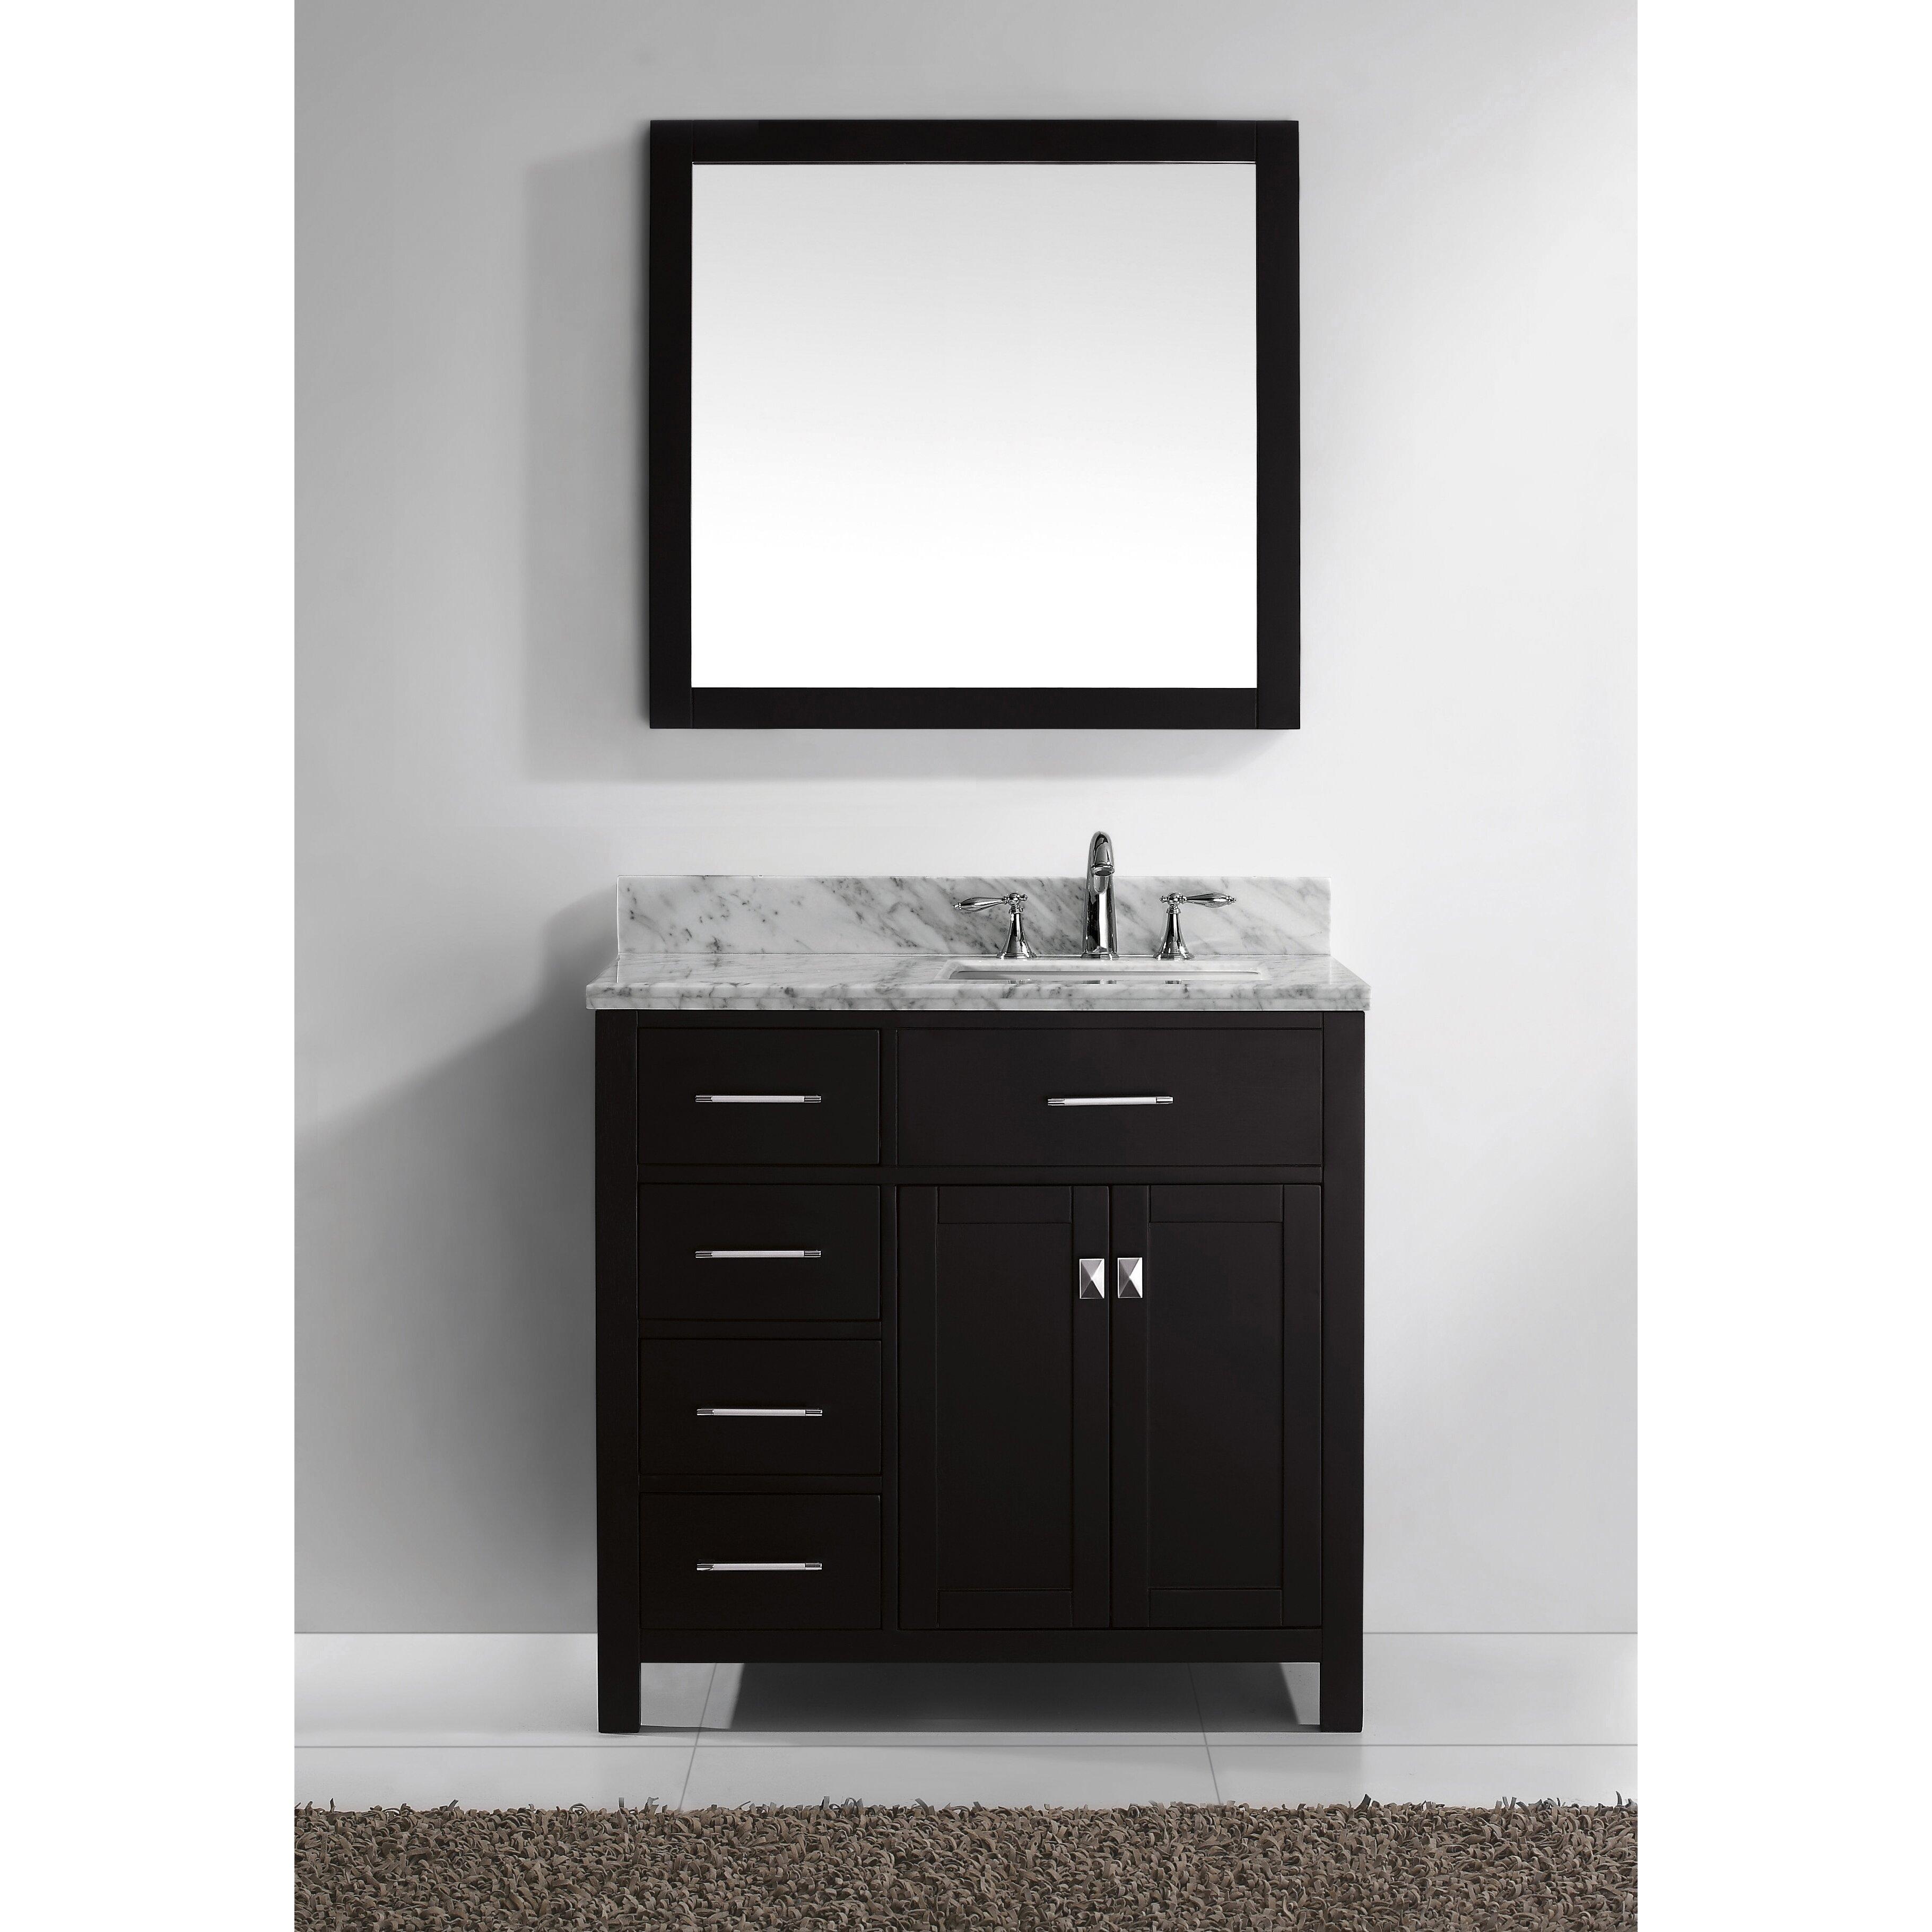 "Virtu Caroline Parkway 35"" Single Bathroom Vanity Set with Carrara White"